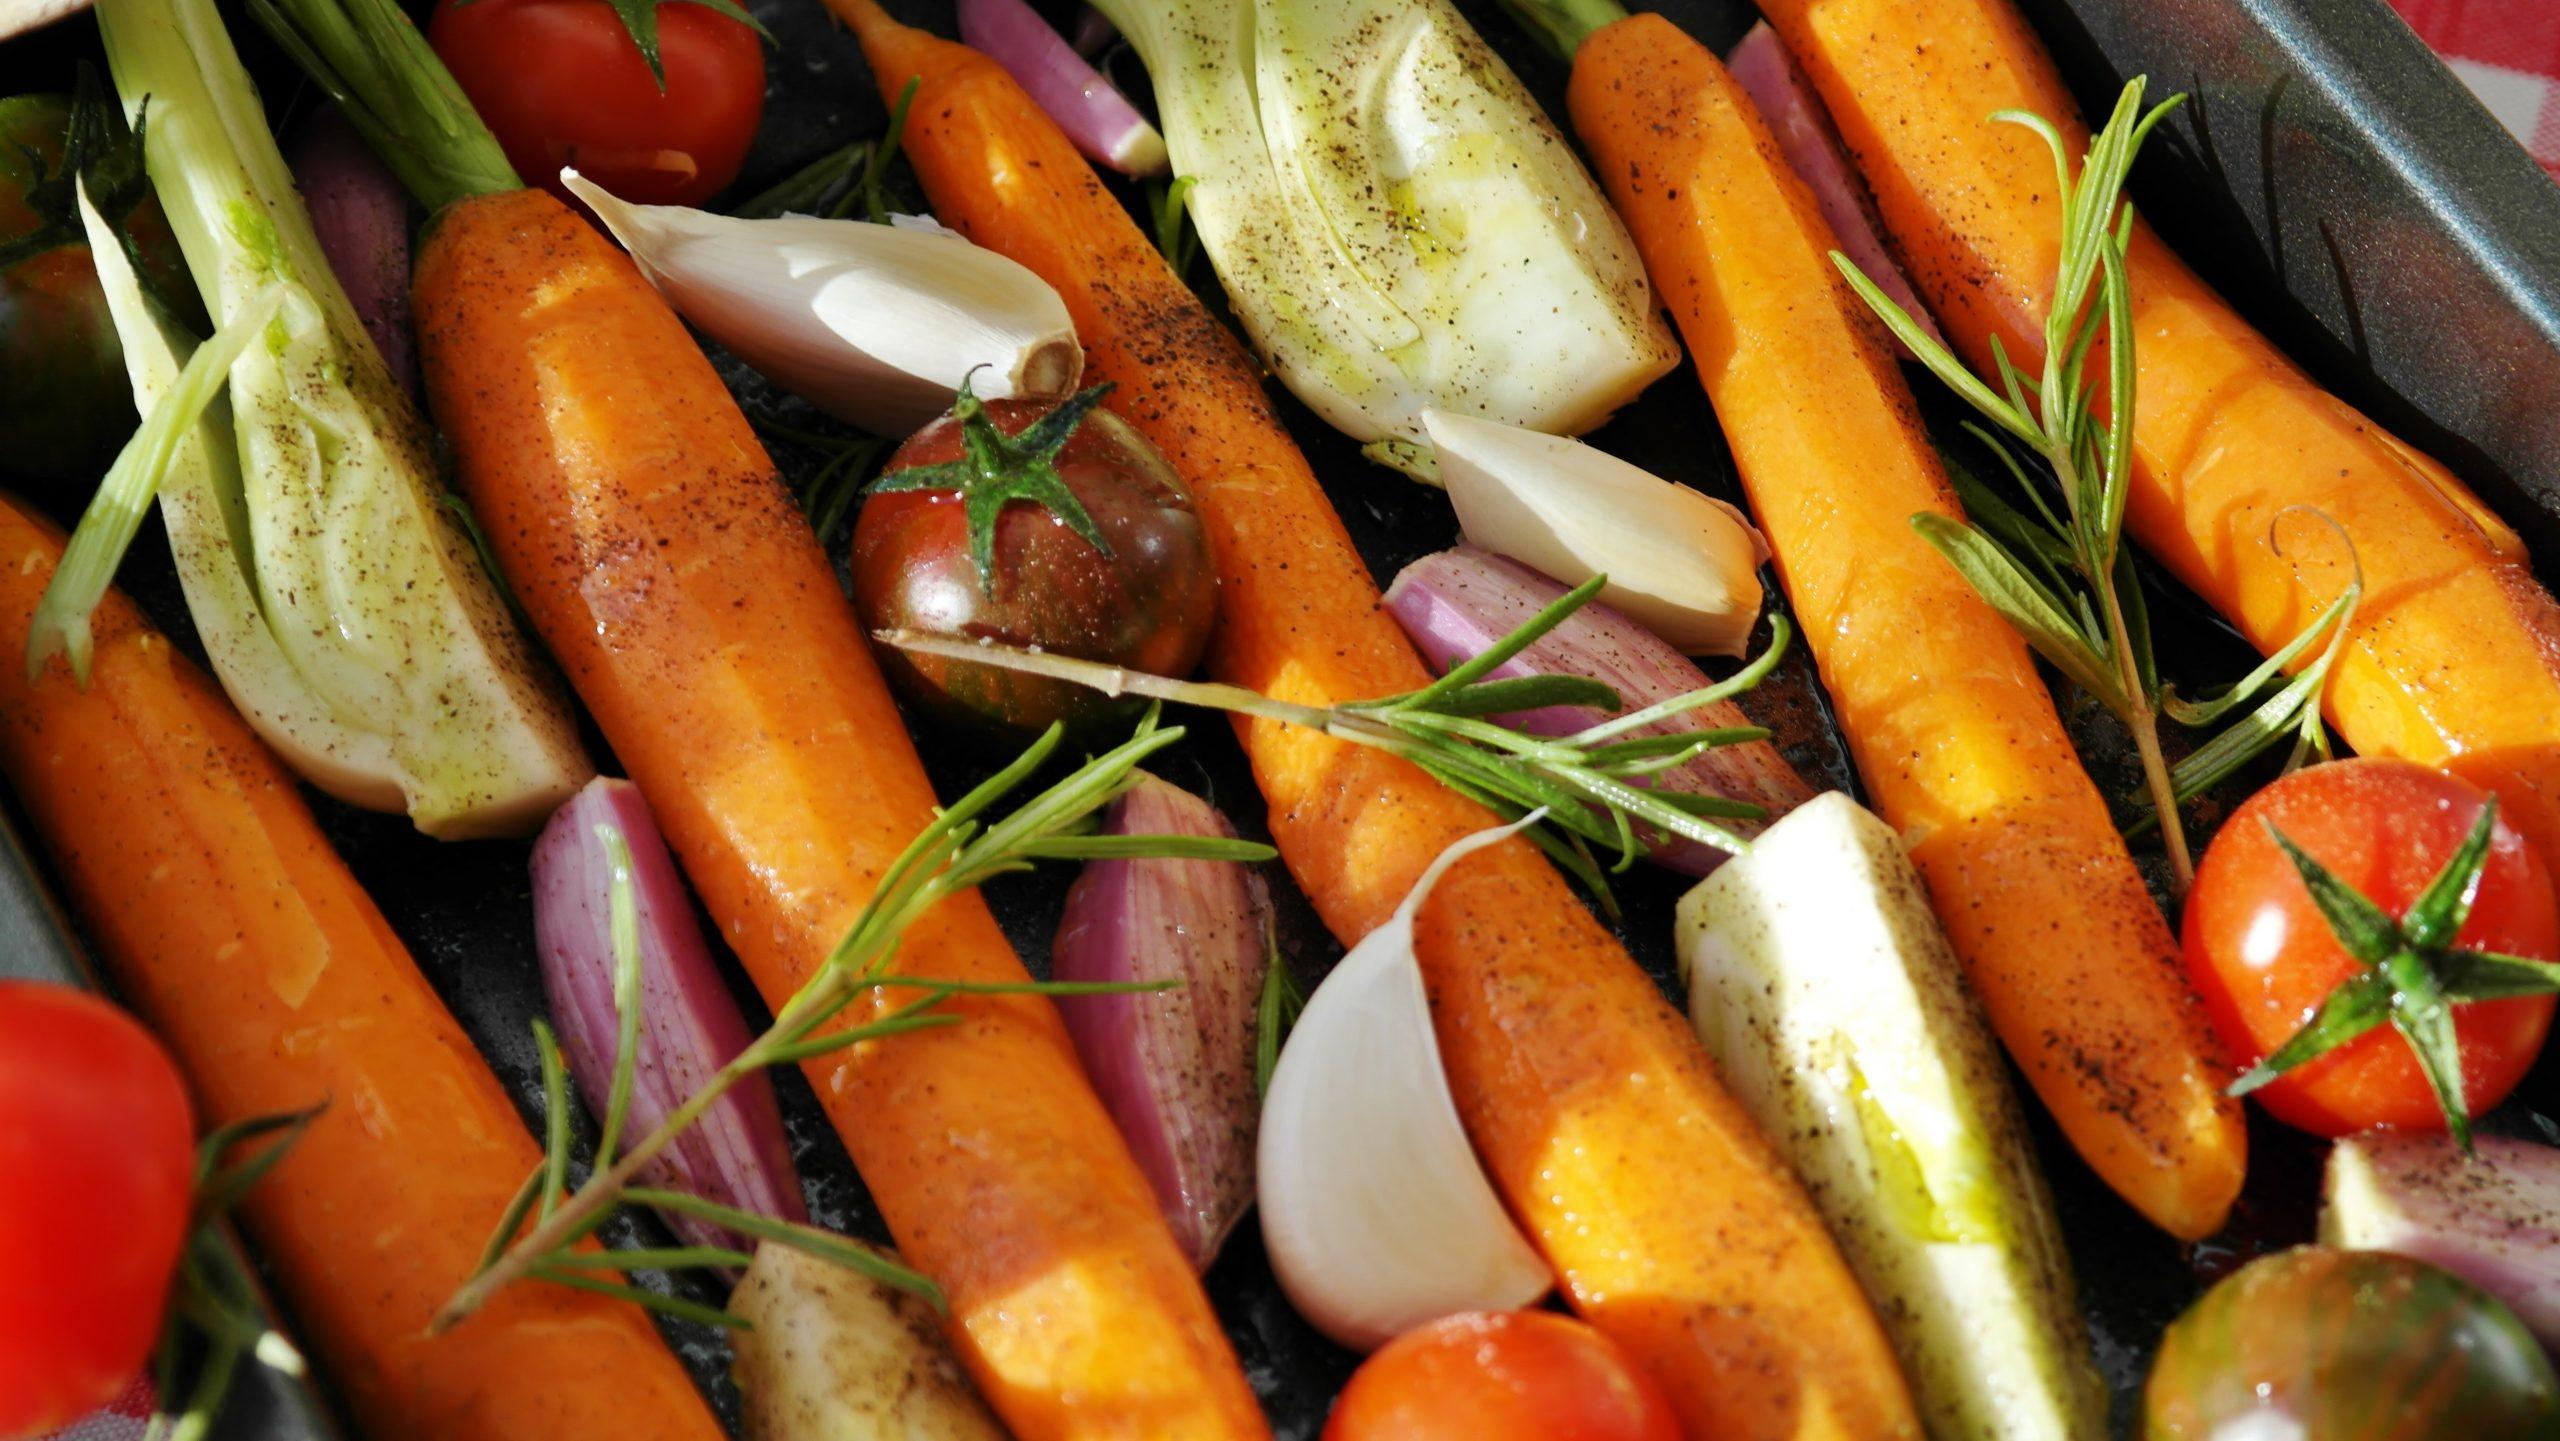 Easy Herby Roasted Vegetables